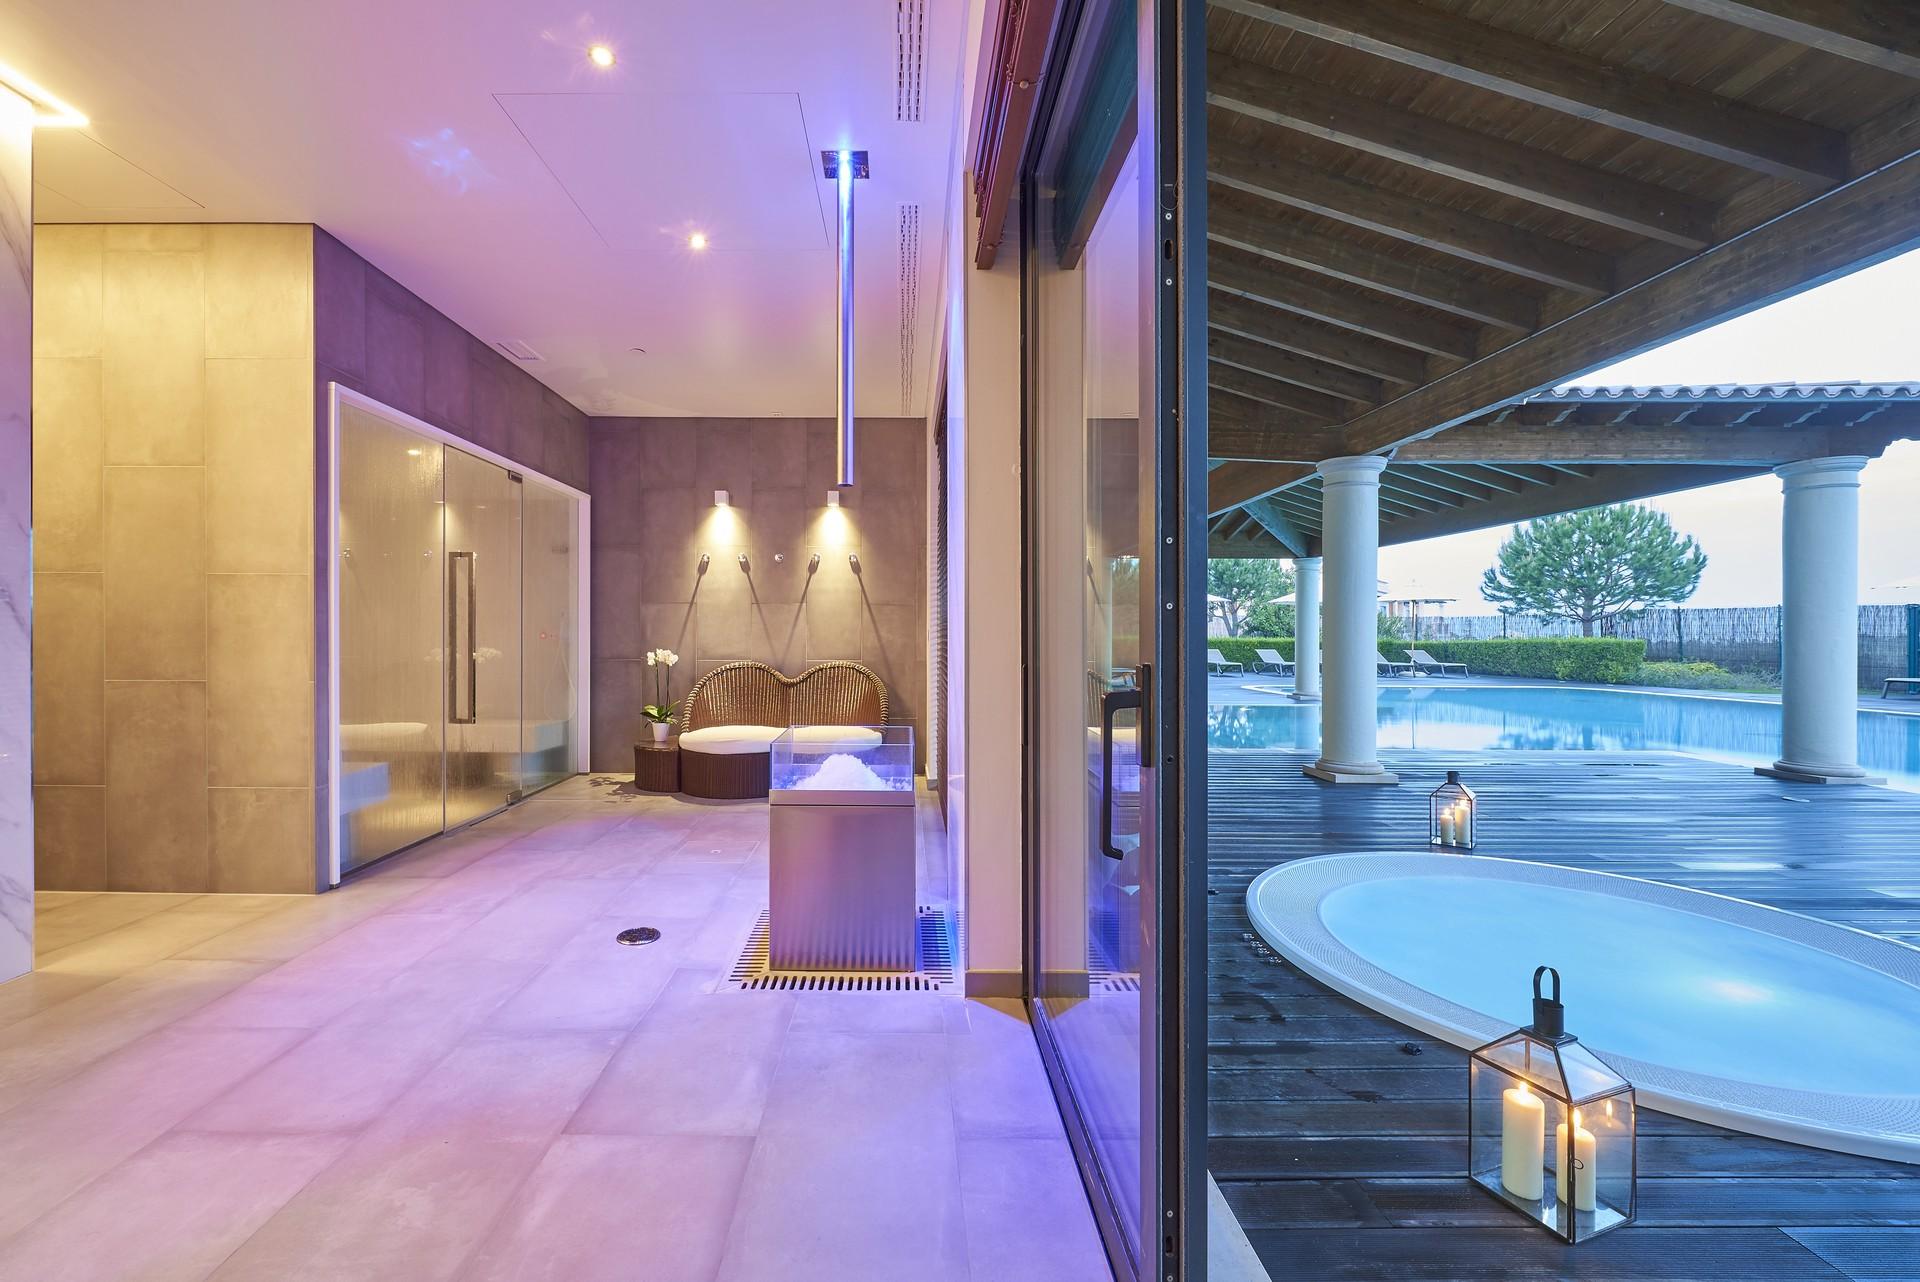 Best Portuguese Spas best portuguese spas Best Portuguese Spas: Cascade Wellness & Lifestyle Resort Best Portuguese Spas 7 1